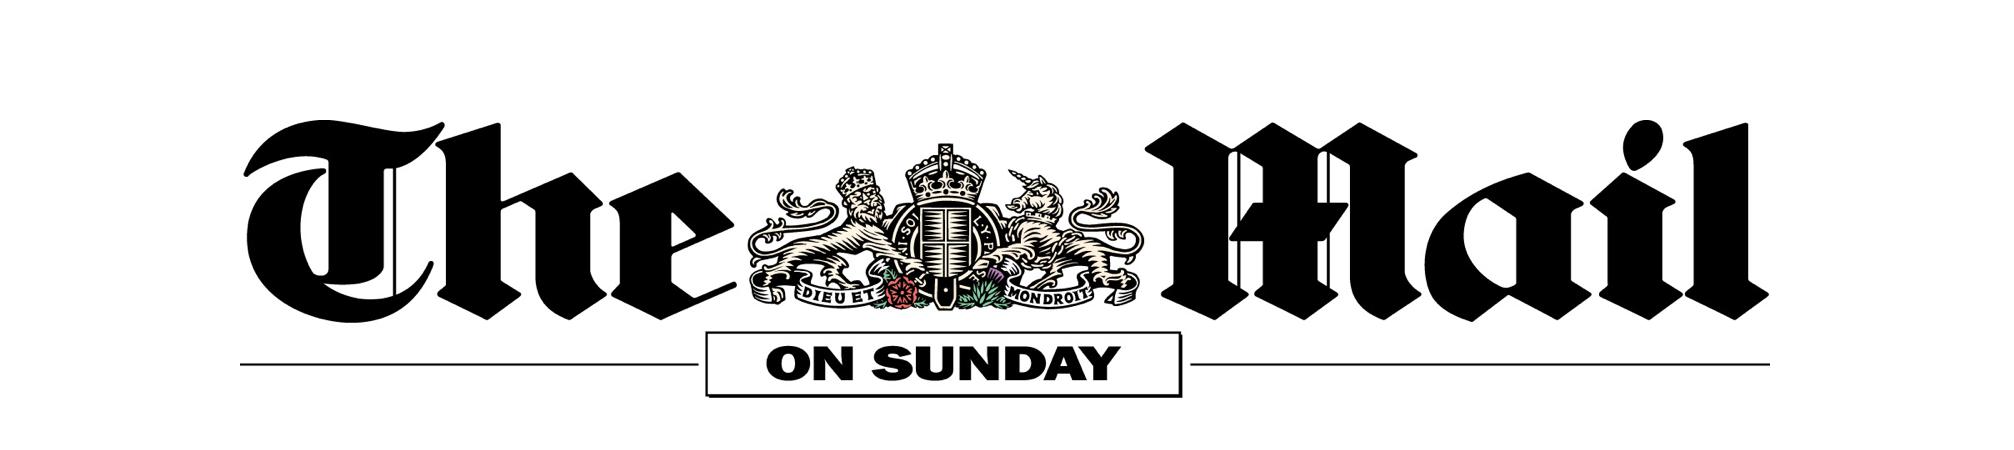 The_mail_on_sunday_logo.jpg